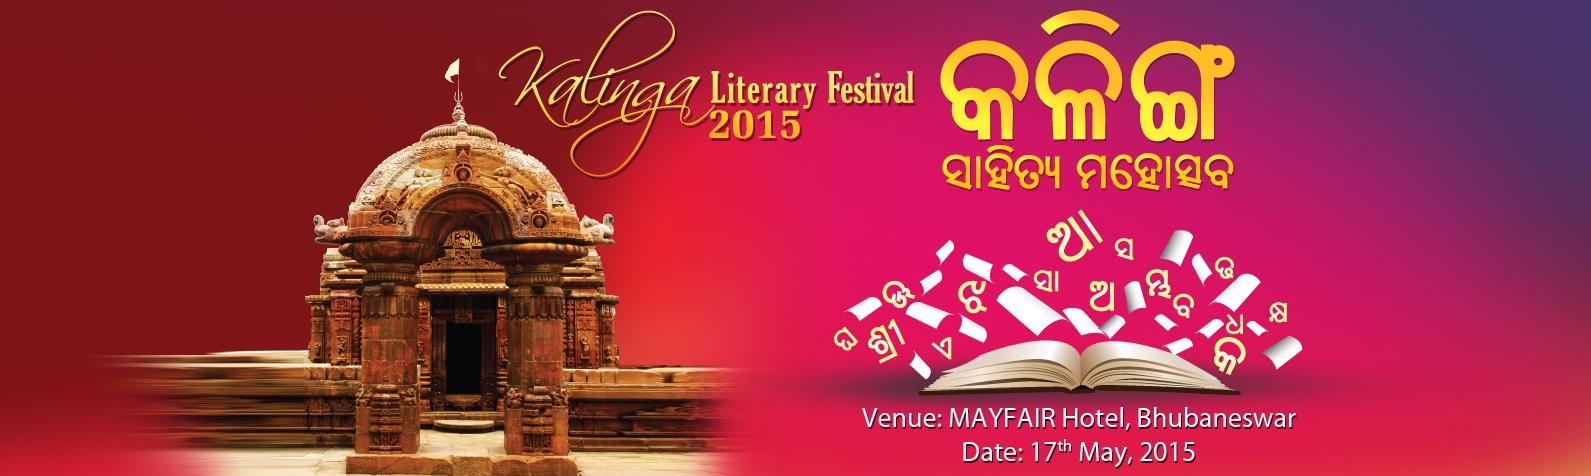 kalinga literary festival 2015